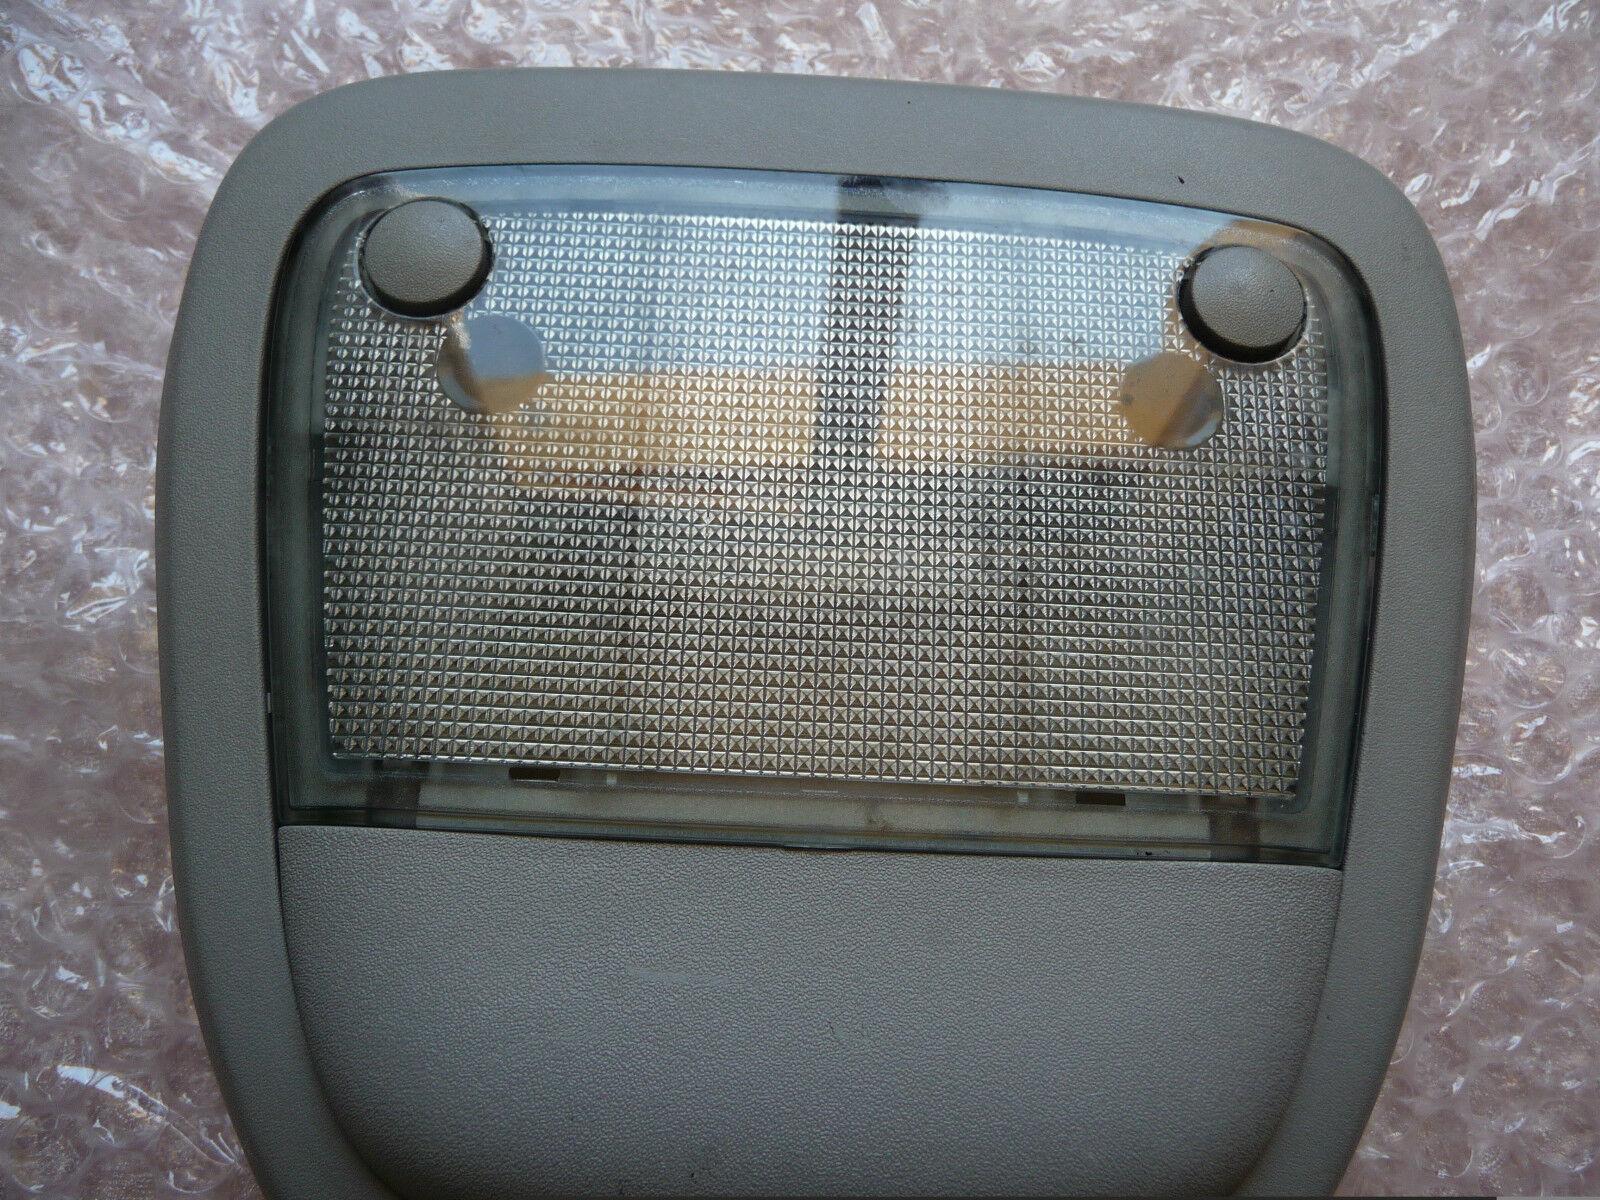 lampe plafonnier eclairage int rieur avant opel meriva a. Black Bedroom Furniture Sets. Home Design Ideas